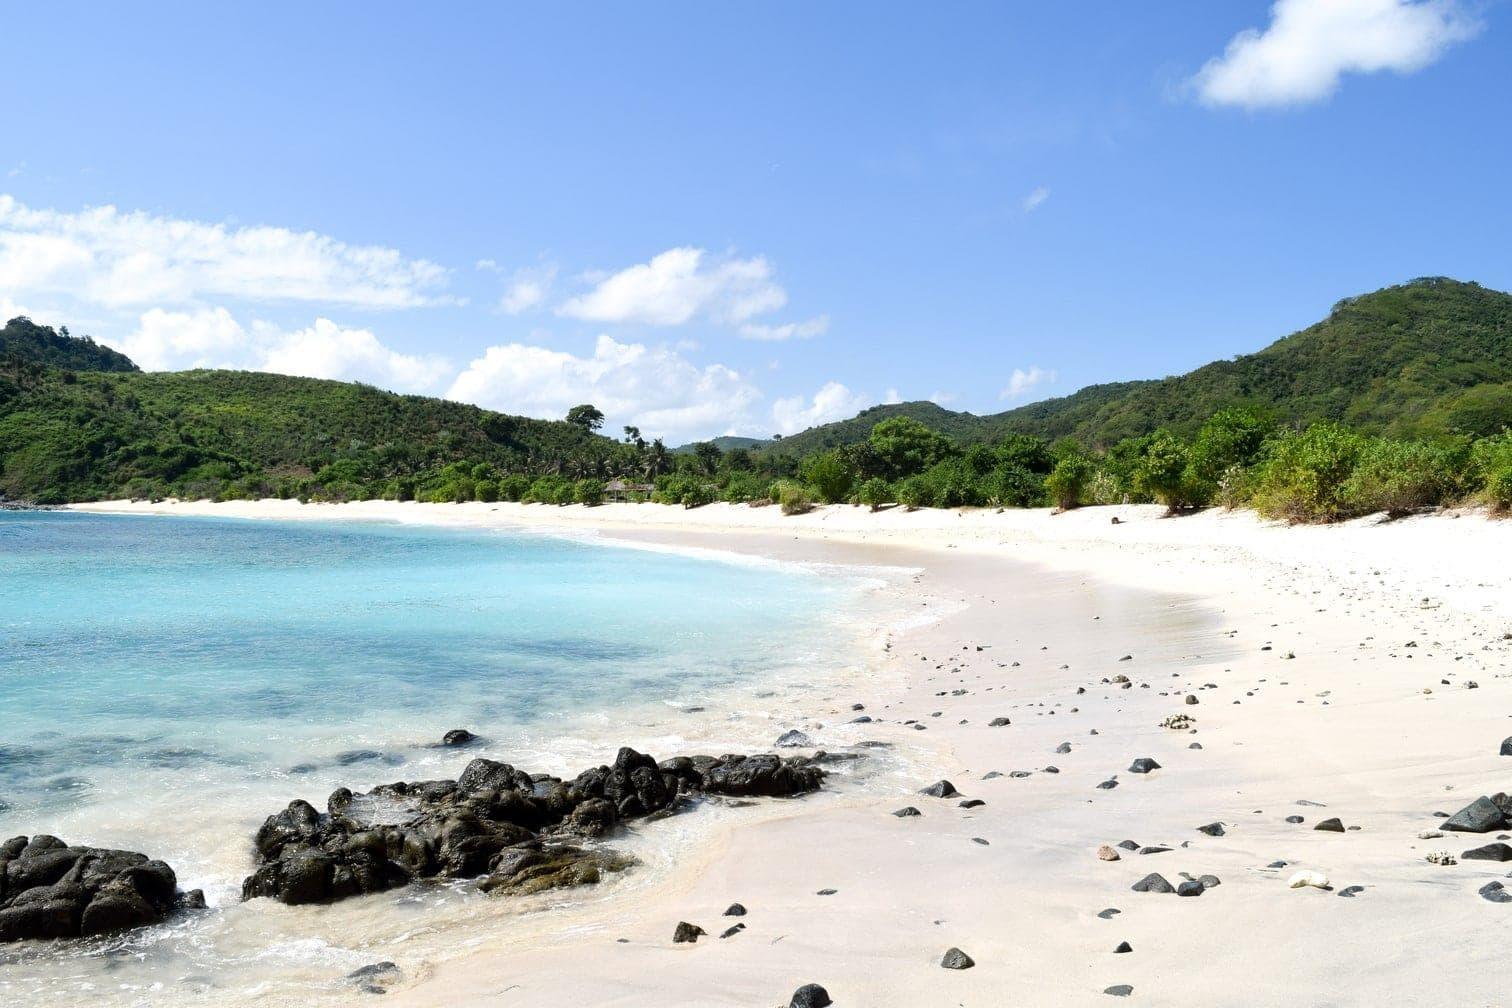 feinen Sand ausfüllen. Der Strand selbst steht unter Naturschutz